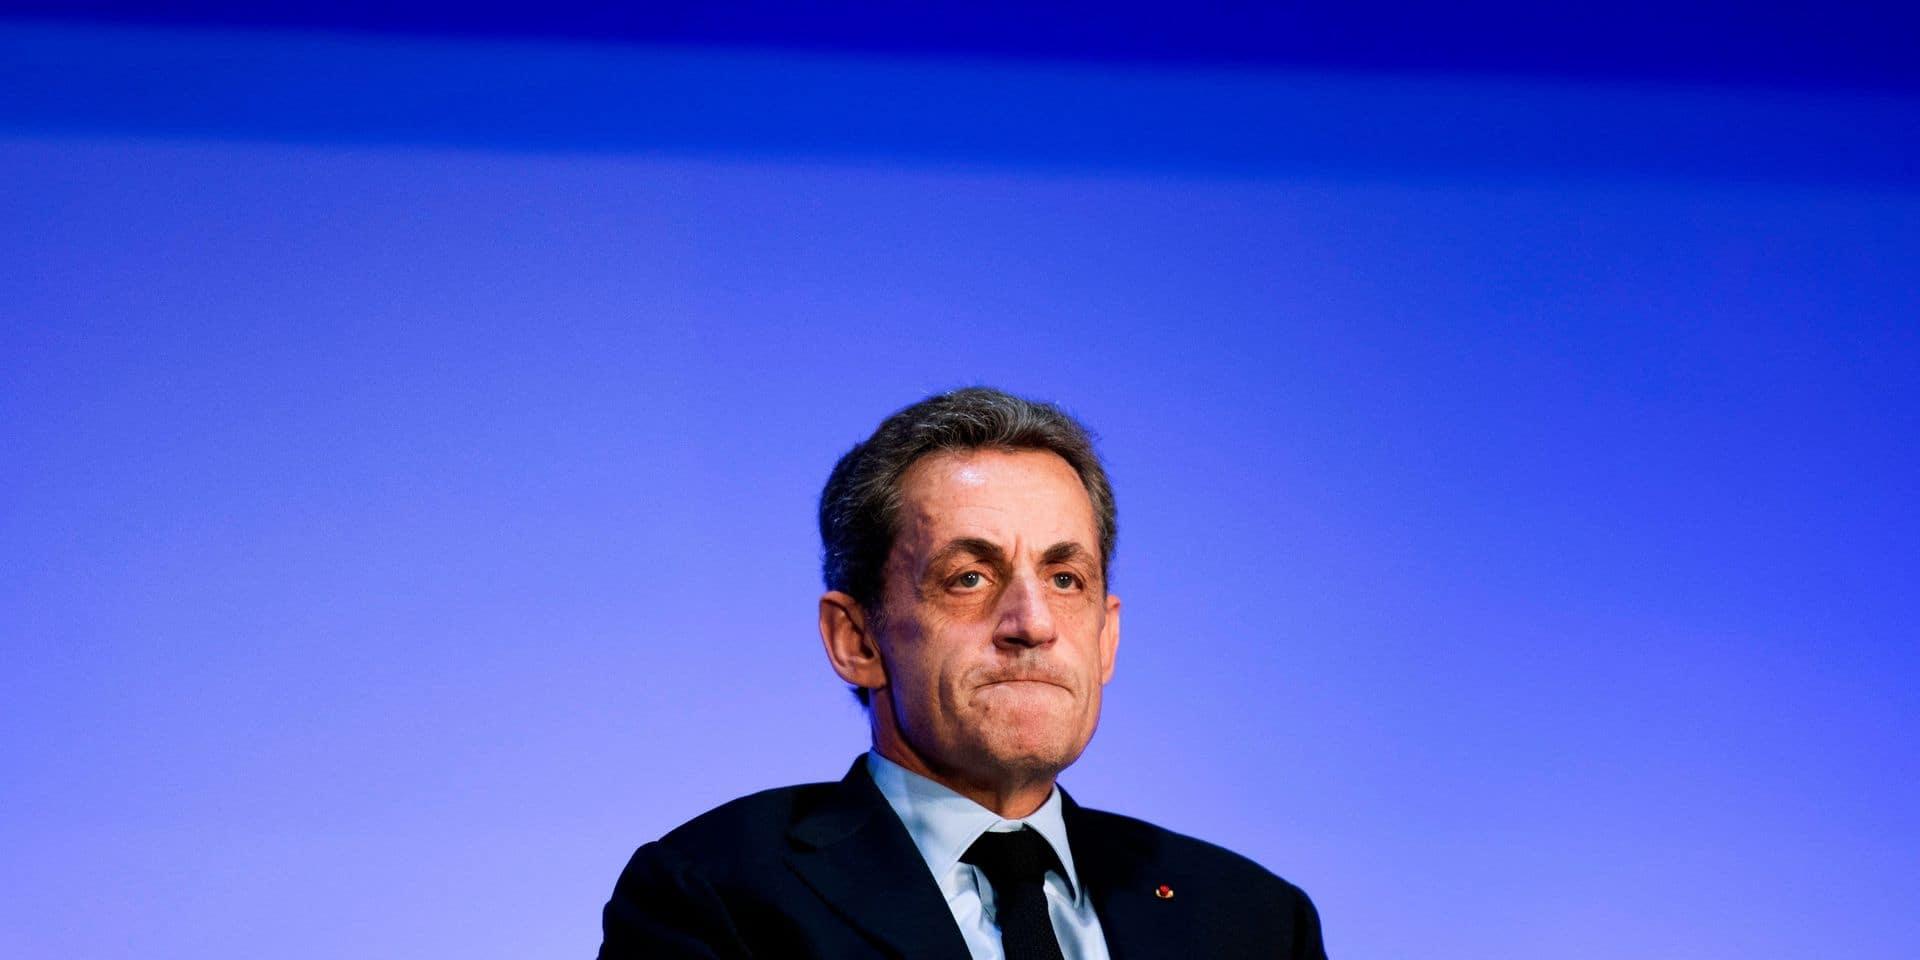 """Attaques"" et ""pression inacceptable"" de Sarkozy contre les juges d'instruction : les syndicats de magistrats dénoncent"